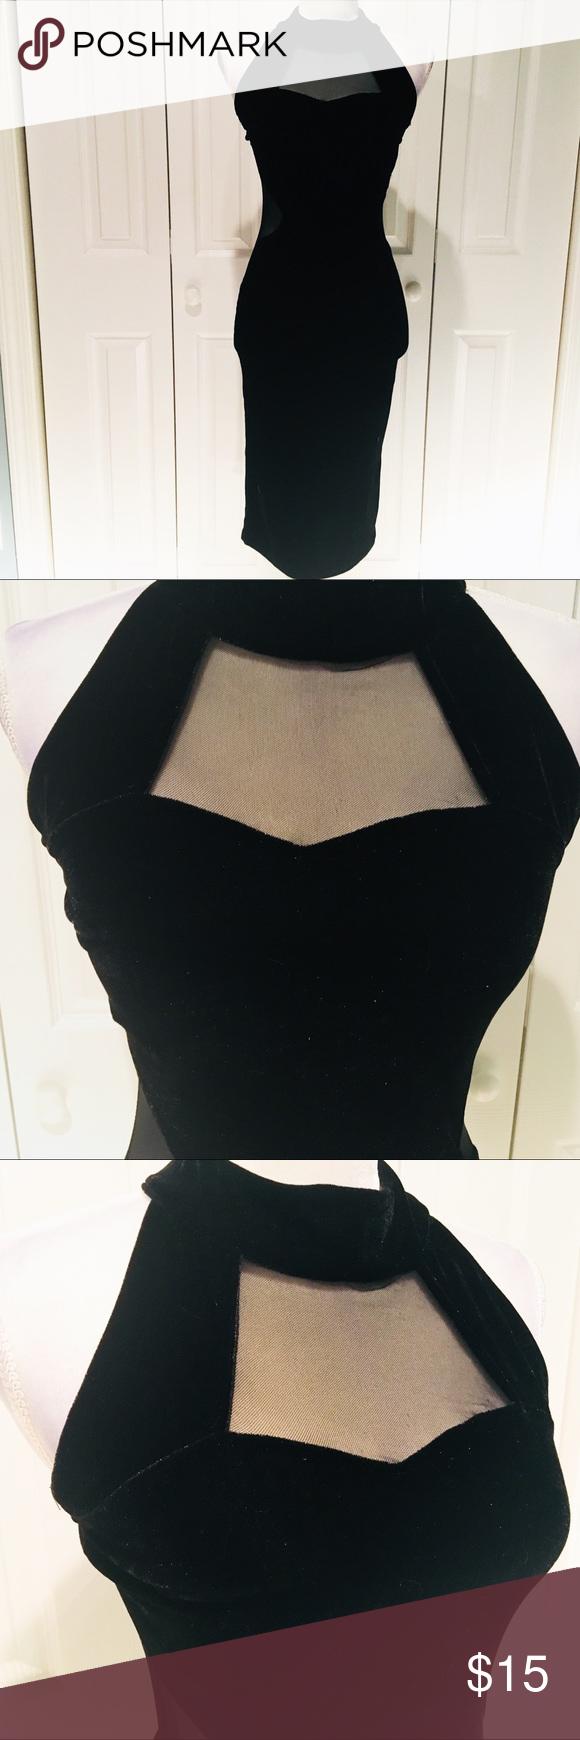 Nwt long sleeveless velvet dress w mesh cutouts nwt my posh picks